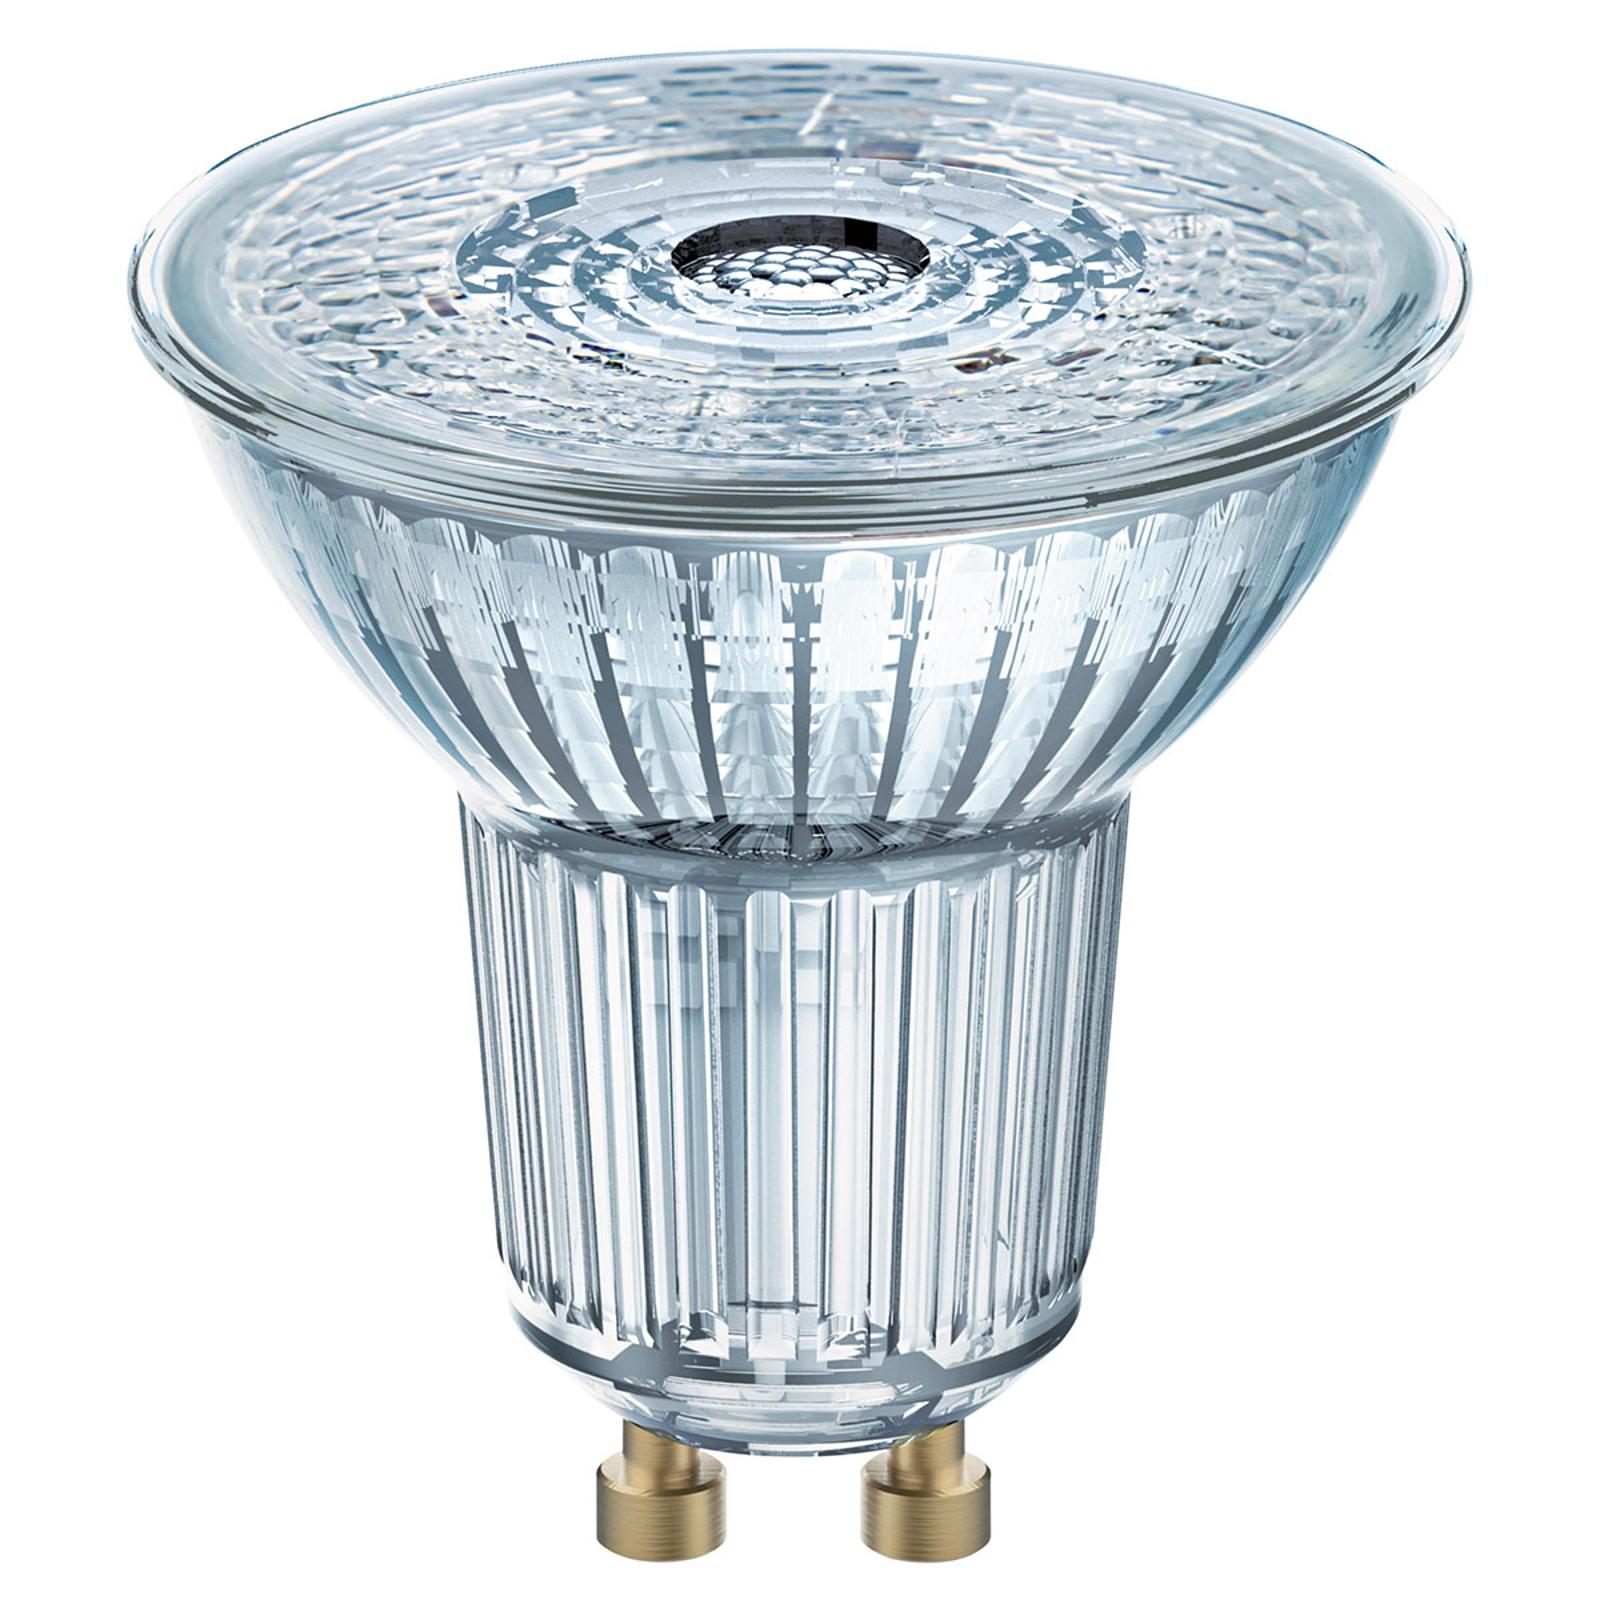 OSRAM szklany reflektor LED GU10 5,5W 940 36°